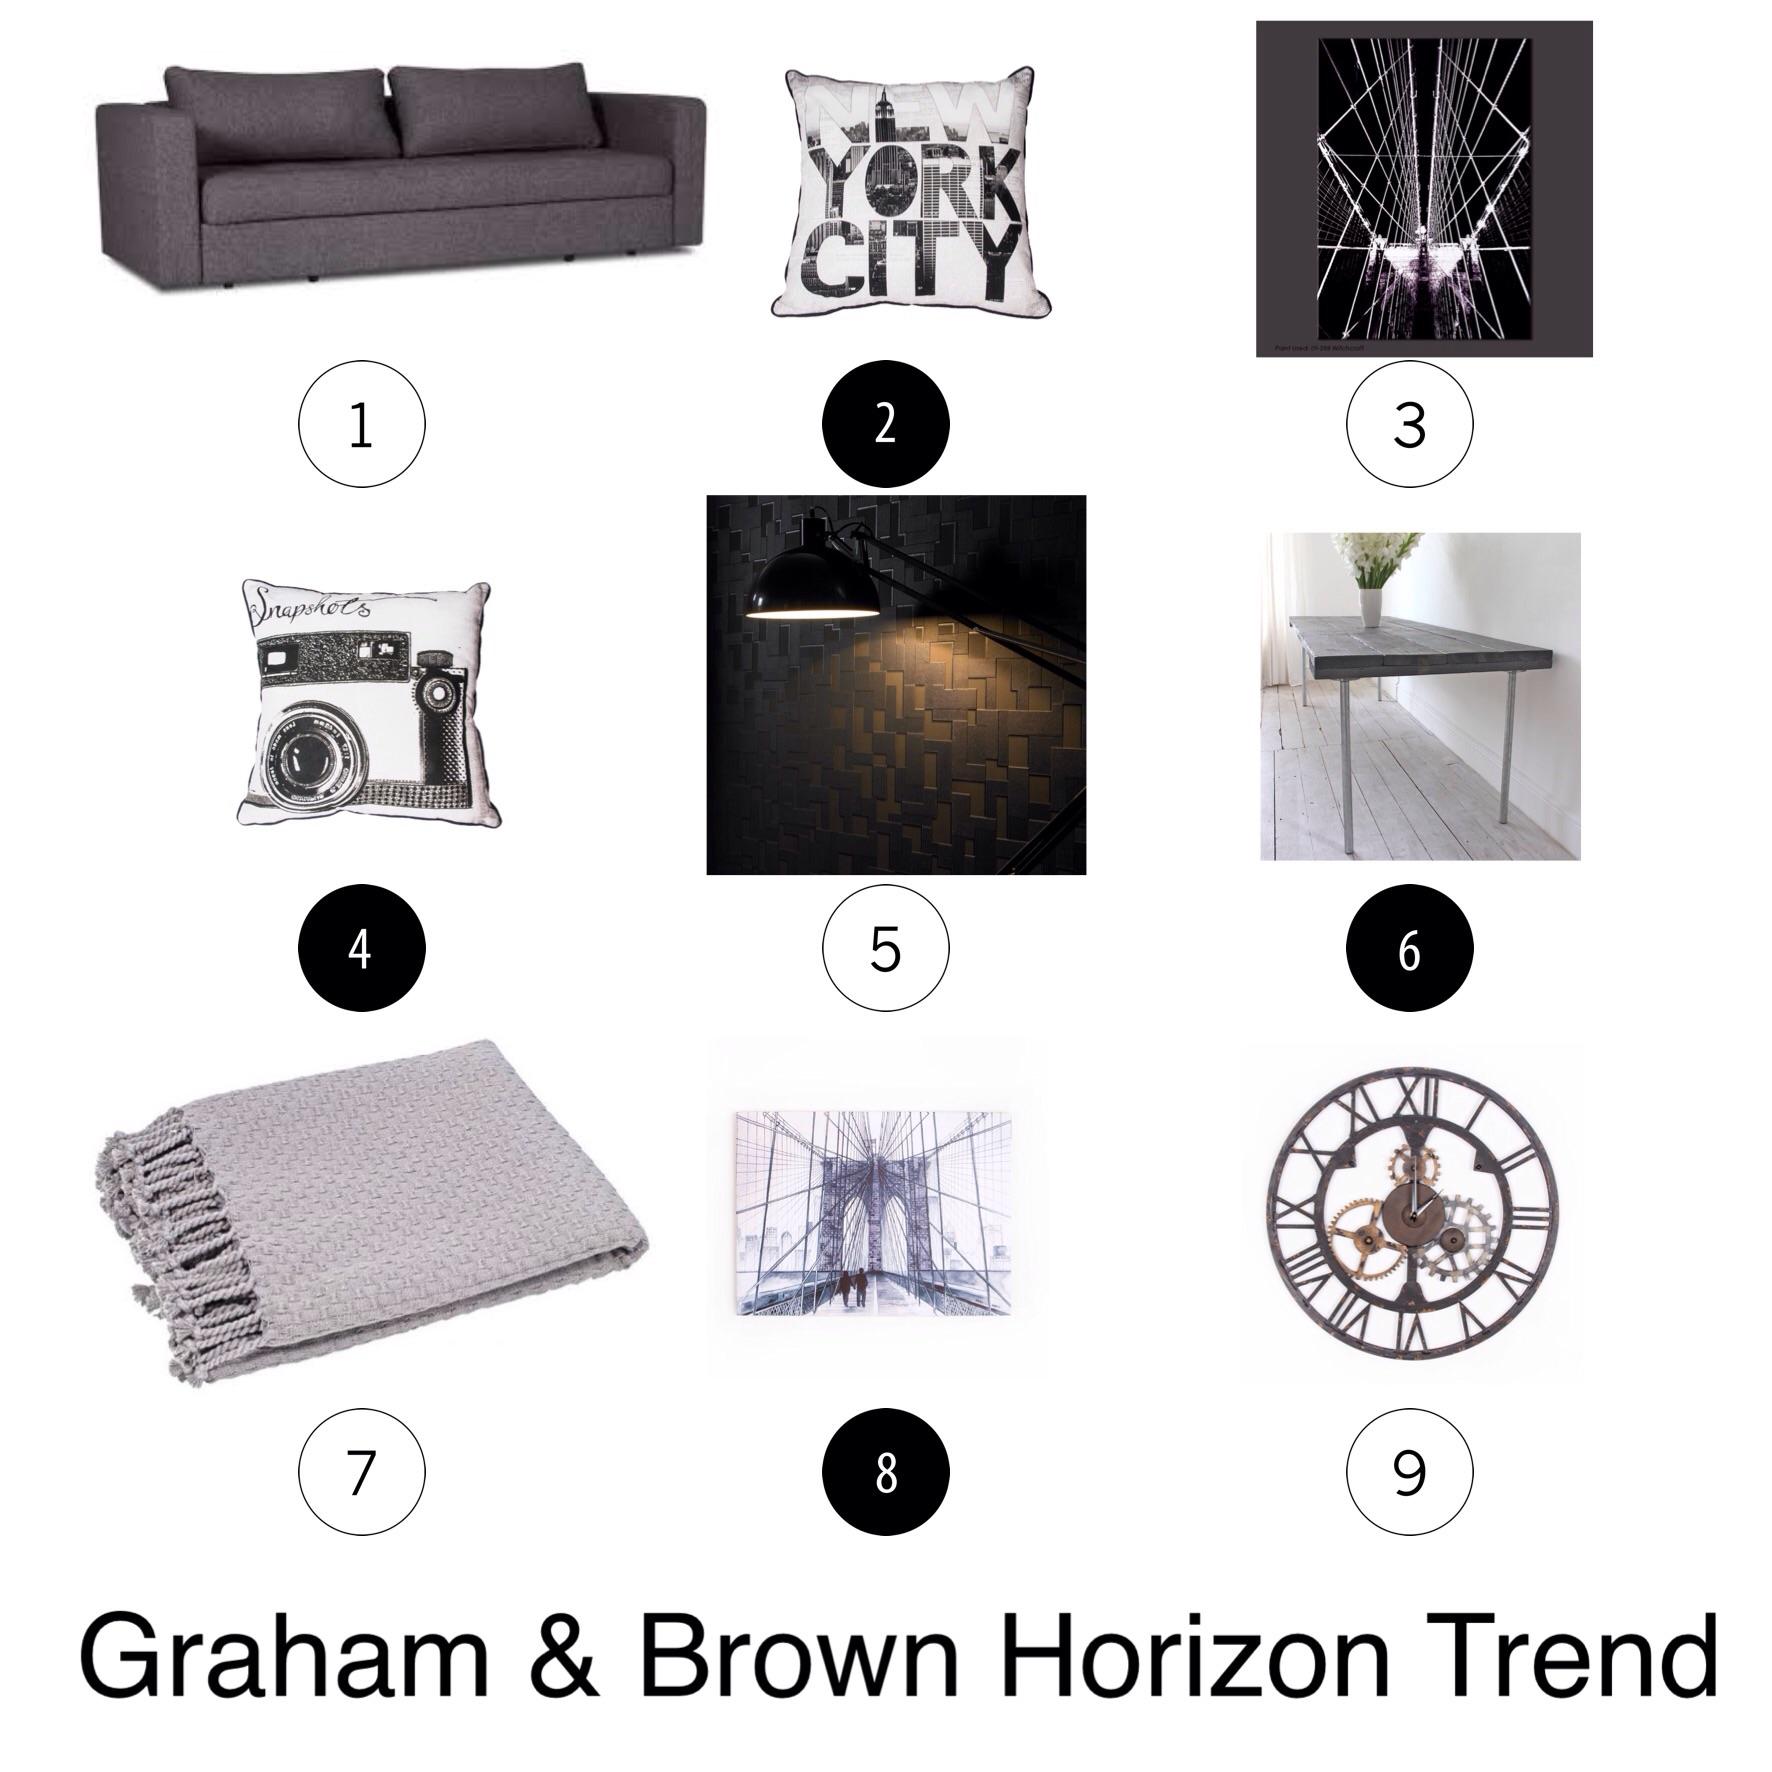 Graham & Brown Horizon Trend